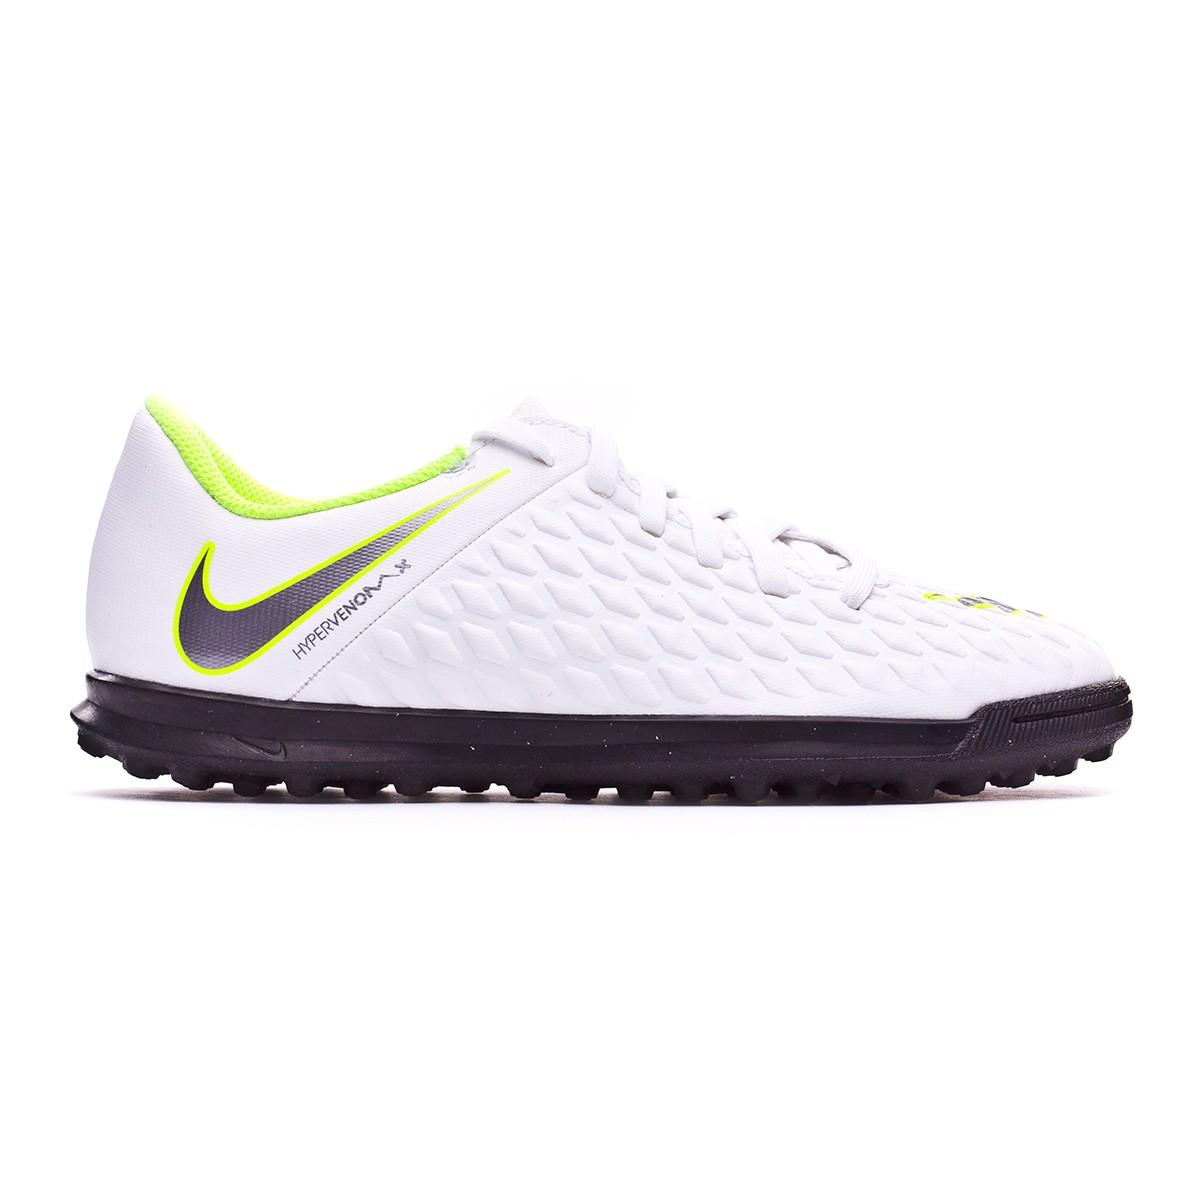 a6a908c24 Football Boot Nike Kids Hypervenom PhantomX III Club Turf White-Metallic  cool grey-Volt-Metallic cool g - Tienda de fútbol Fútbol Emotion